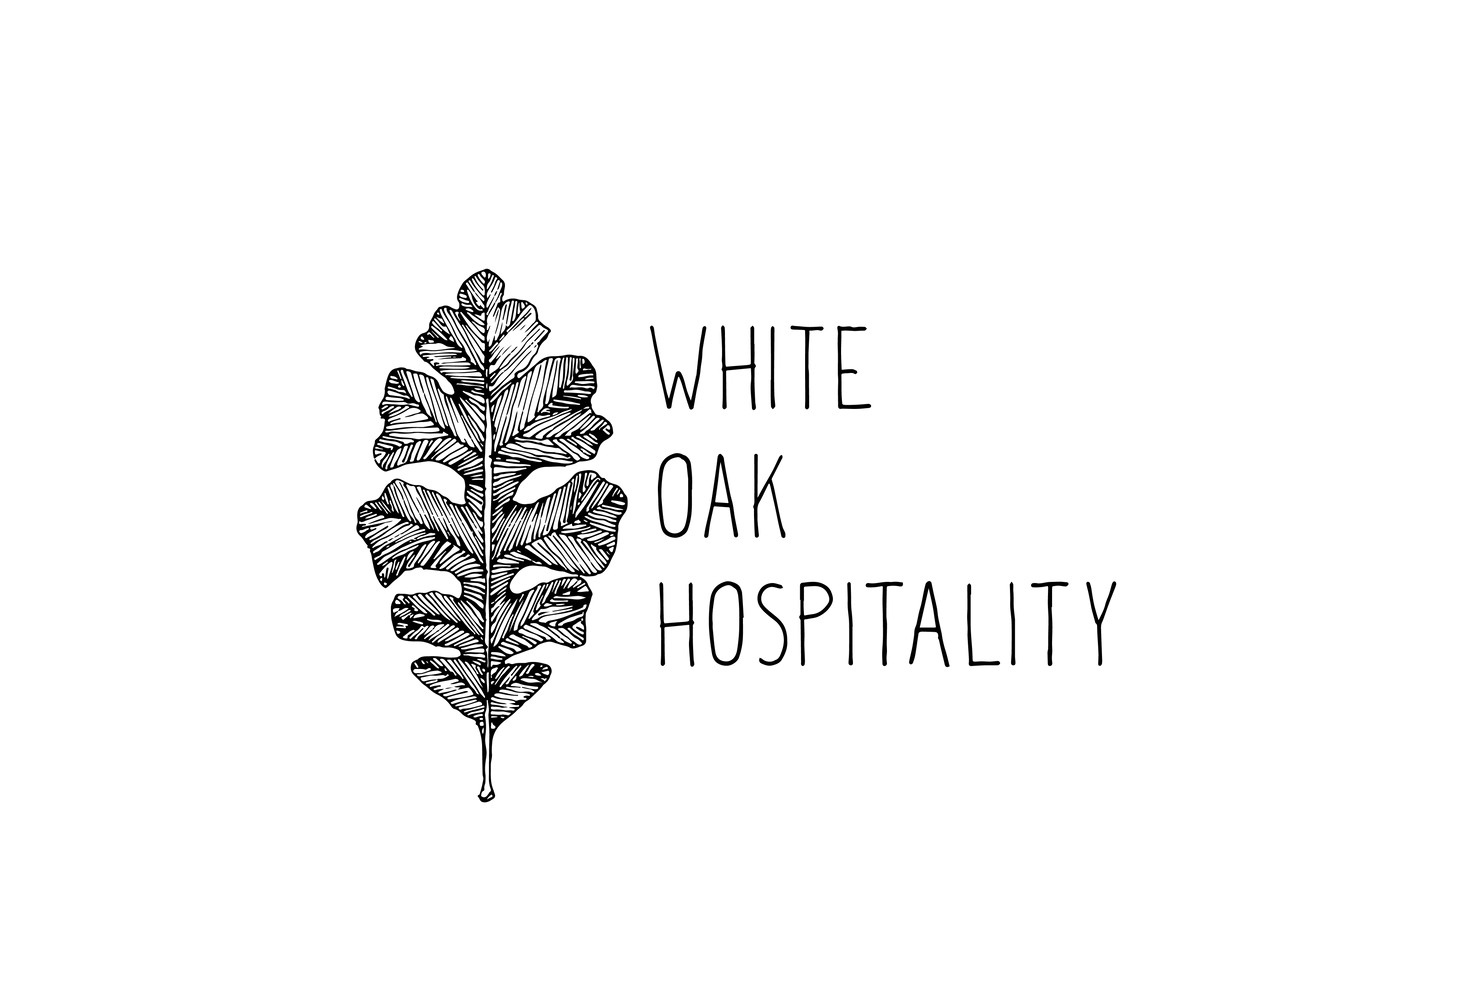 Wayward_OH-Logo-Black-Vertical.png